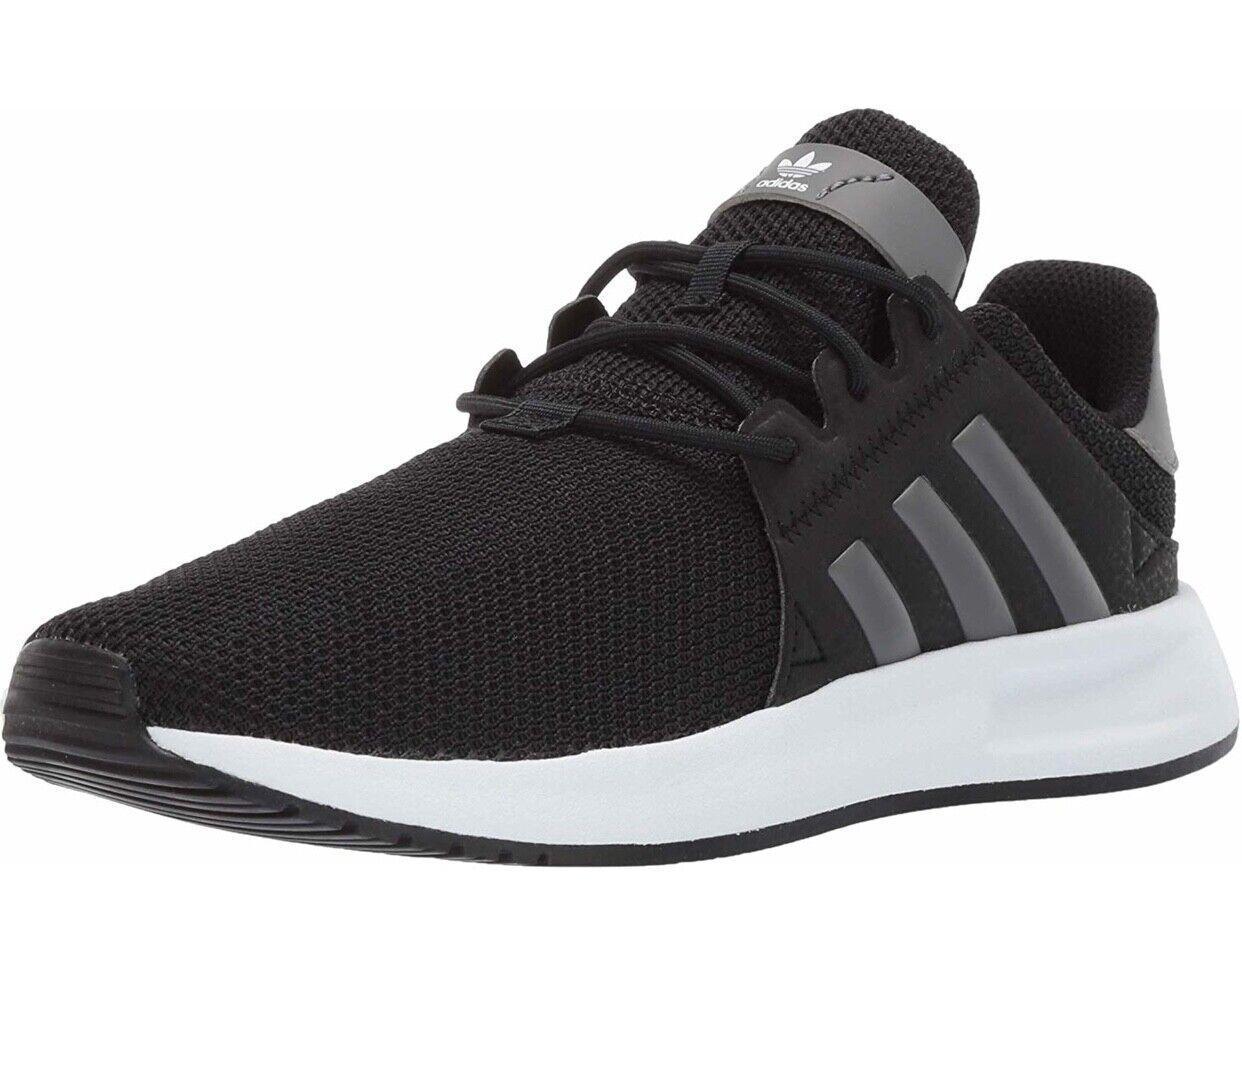 New Kids Boys adidas X_PLR J Running Shoes Multi-Sizes   CG6